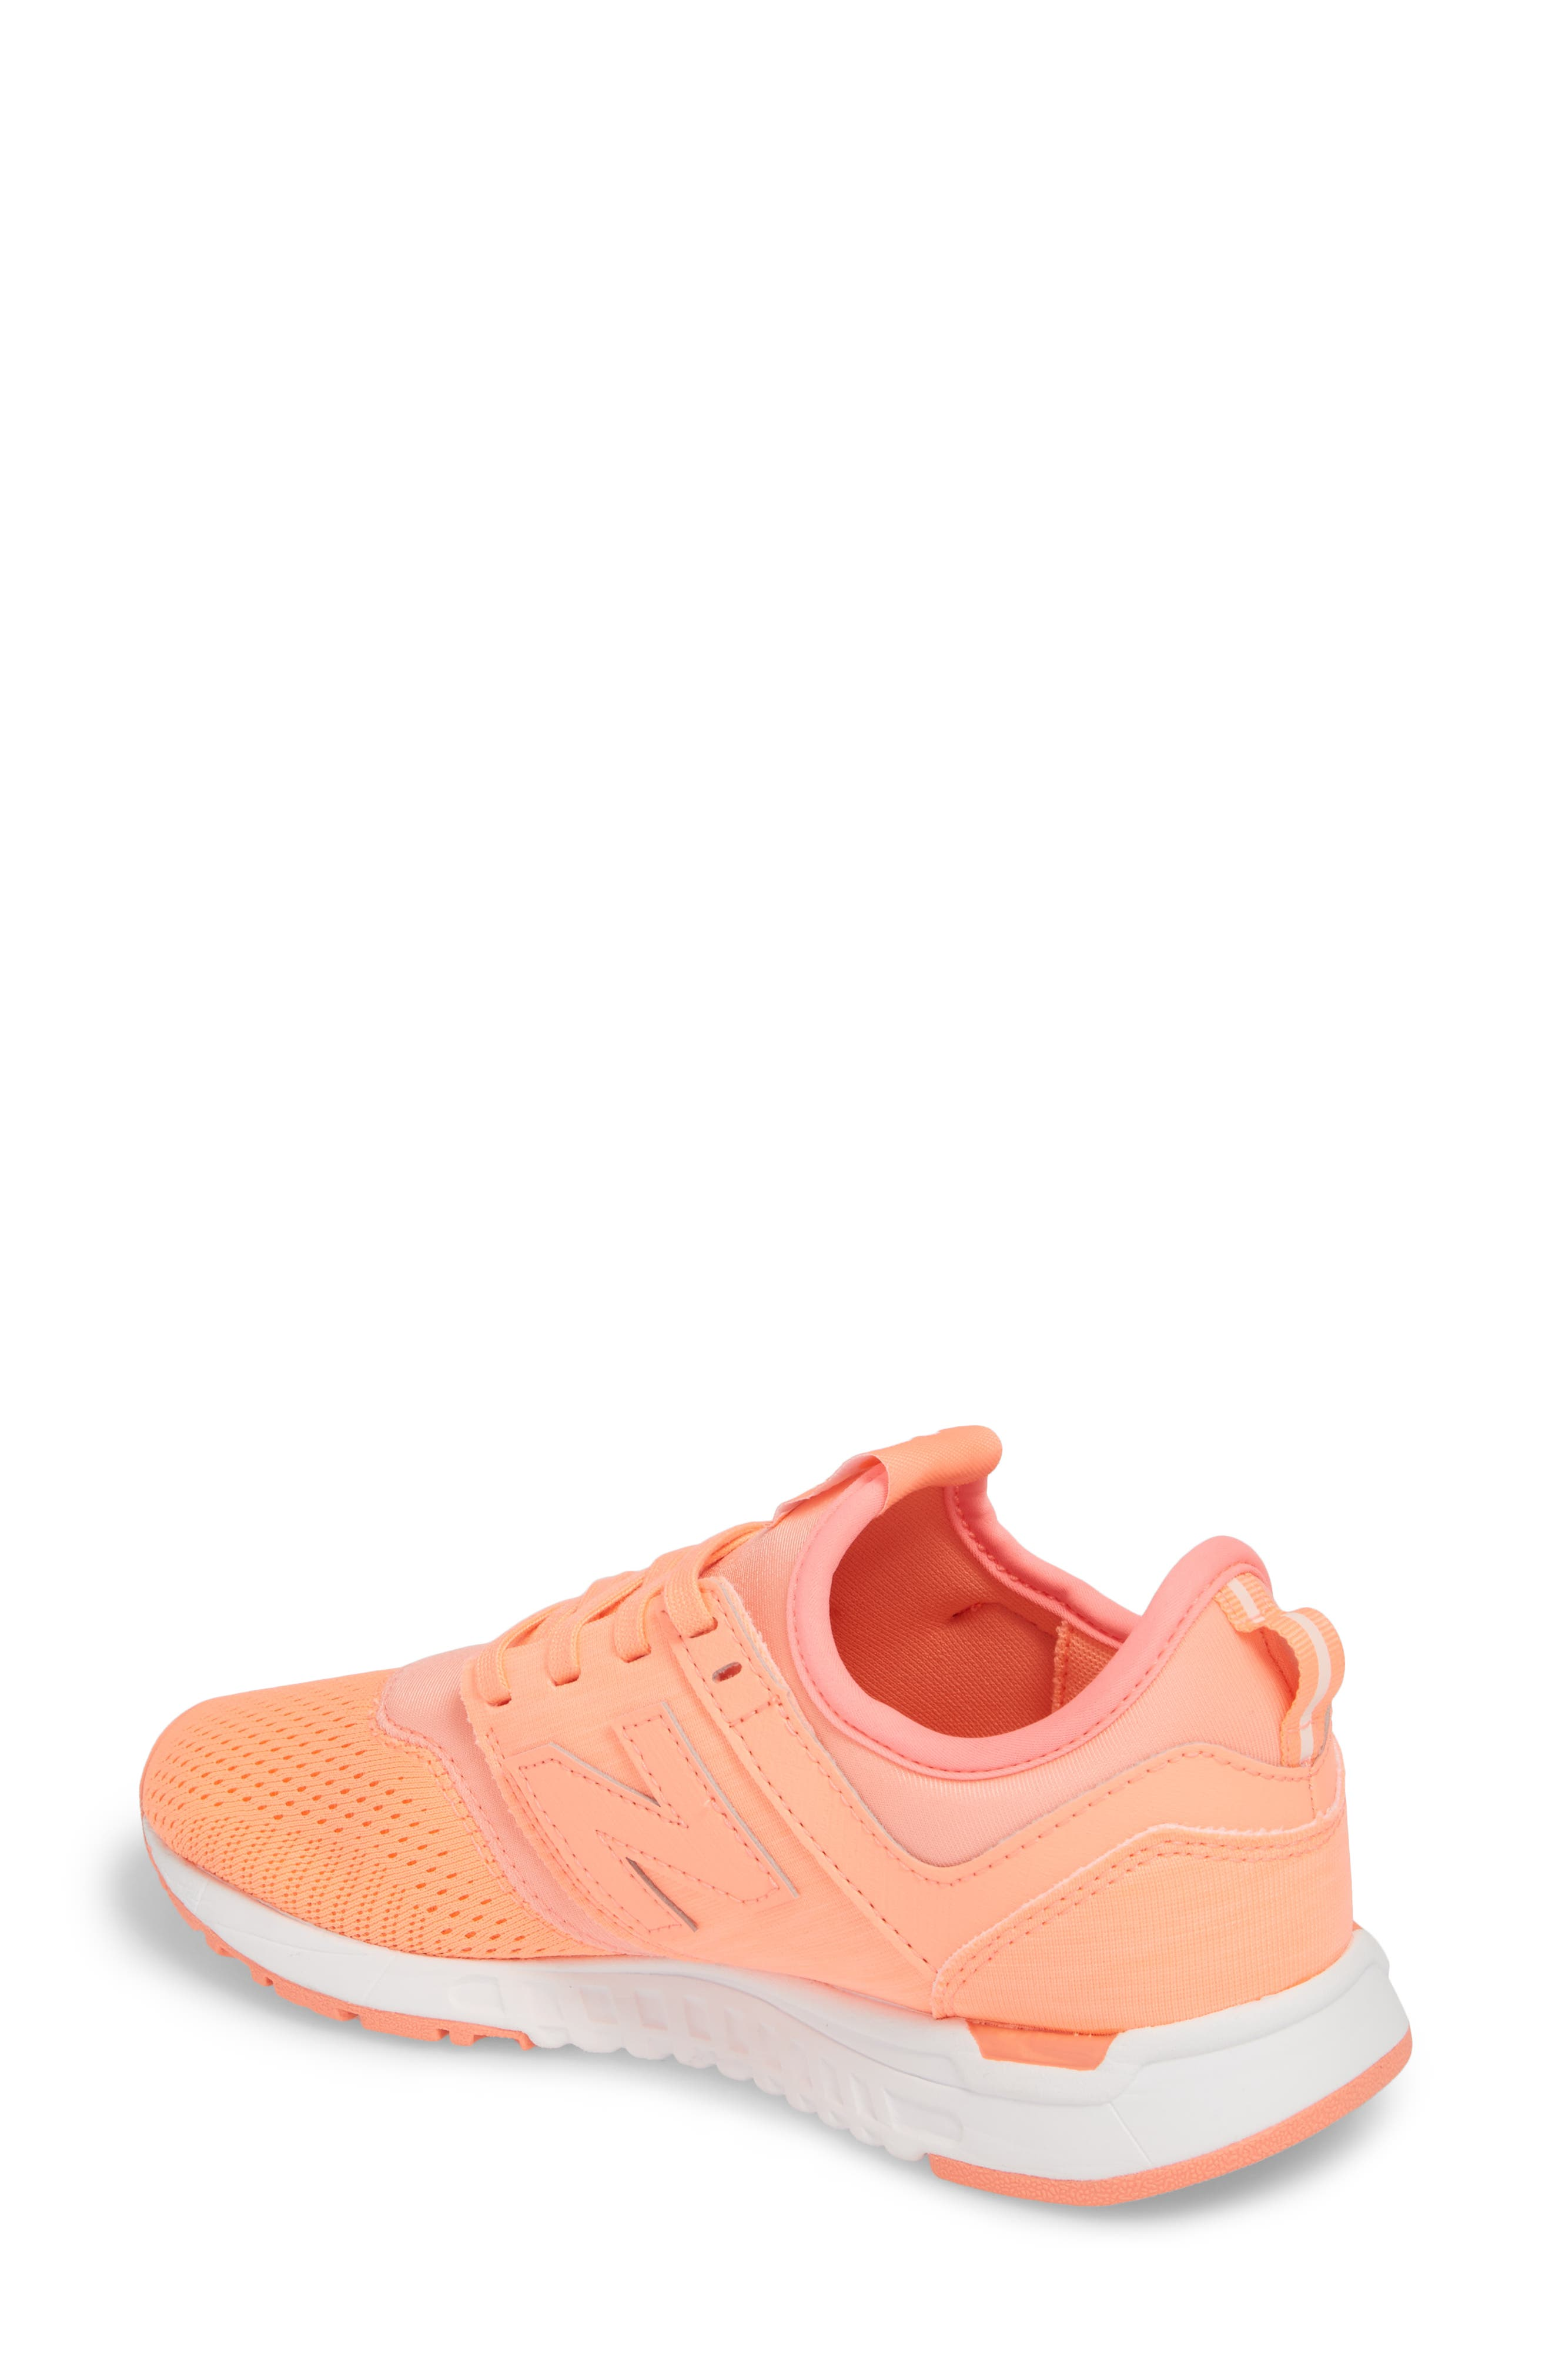 247 Classic Sneaker,                             Alternate thumbnail 4, color,